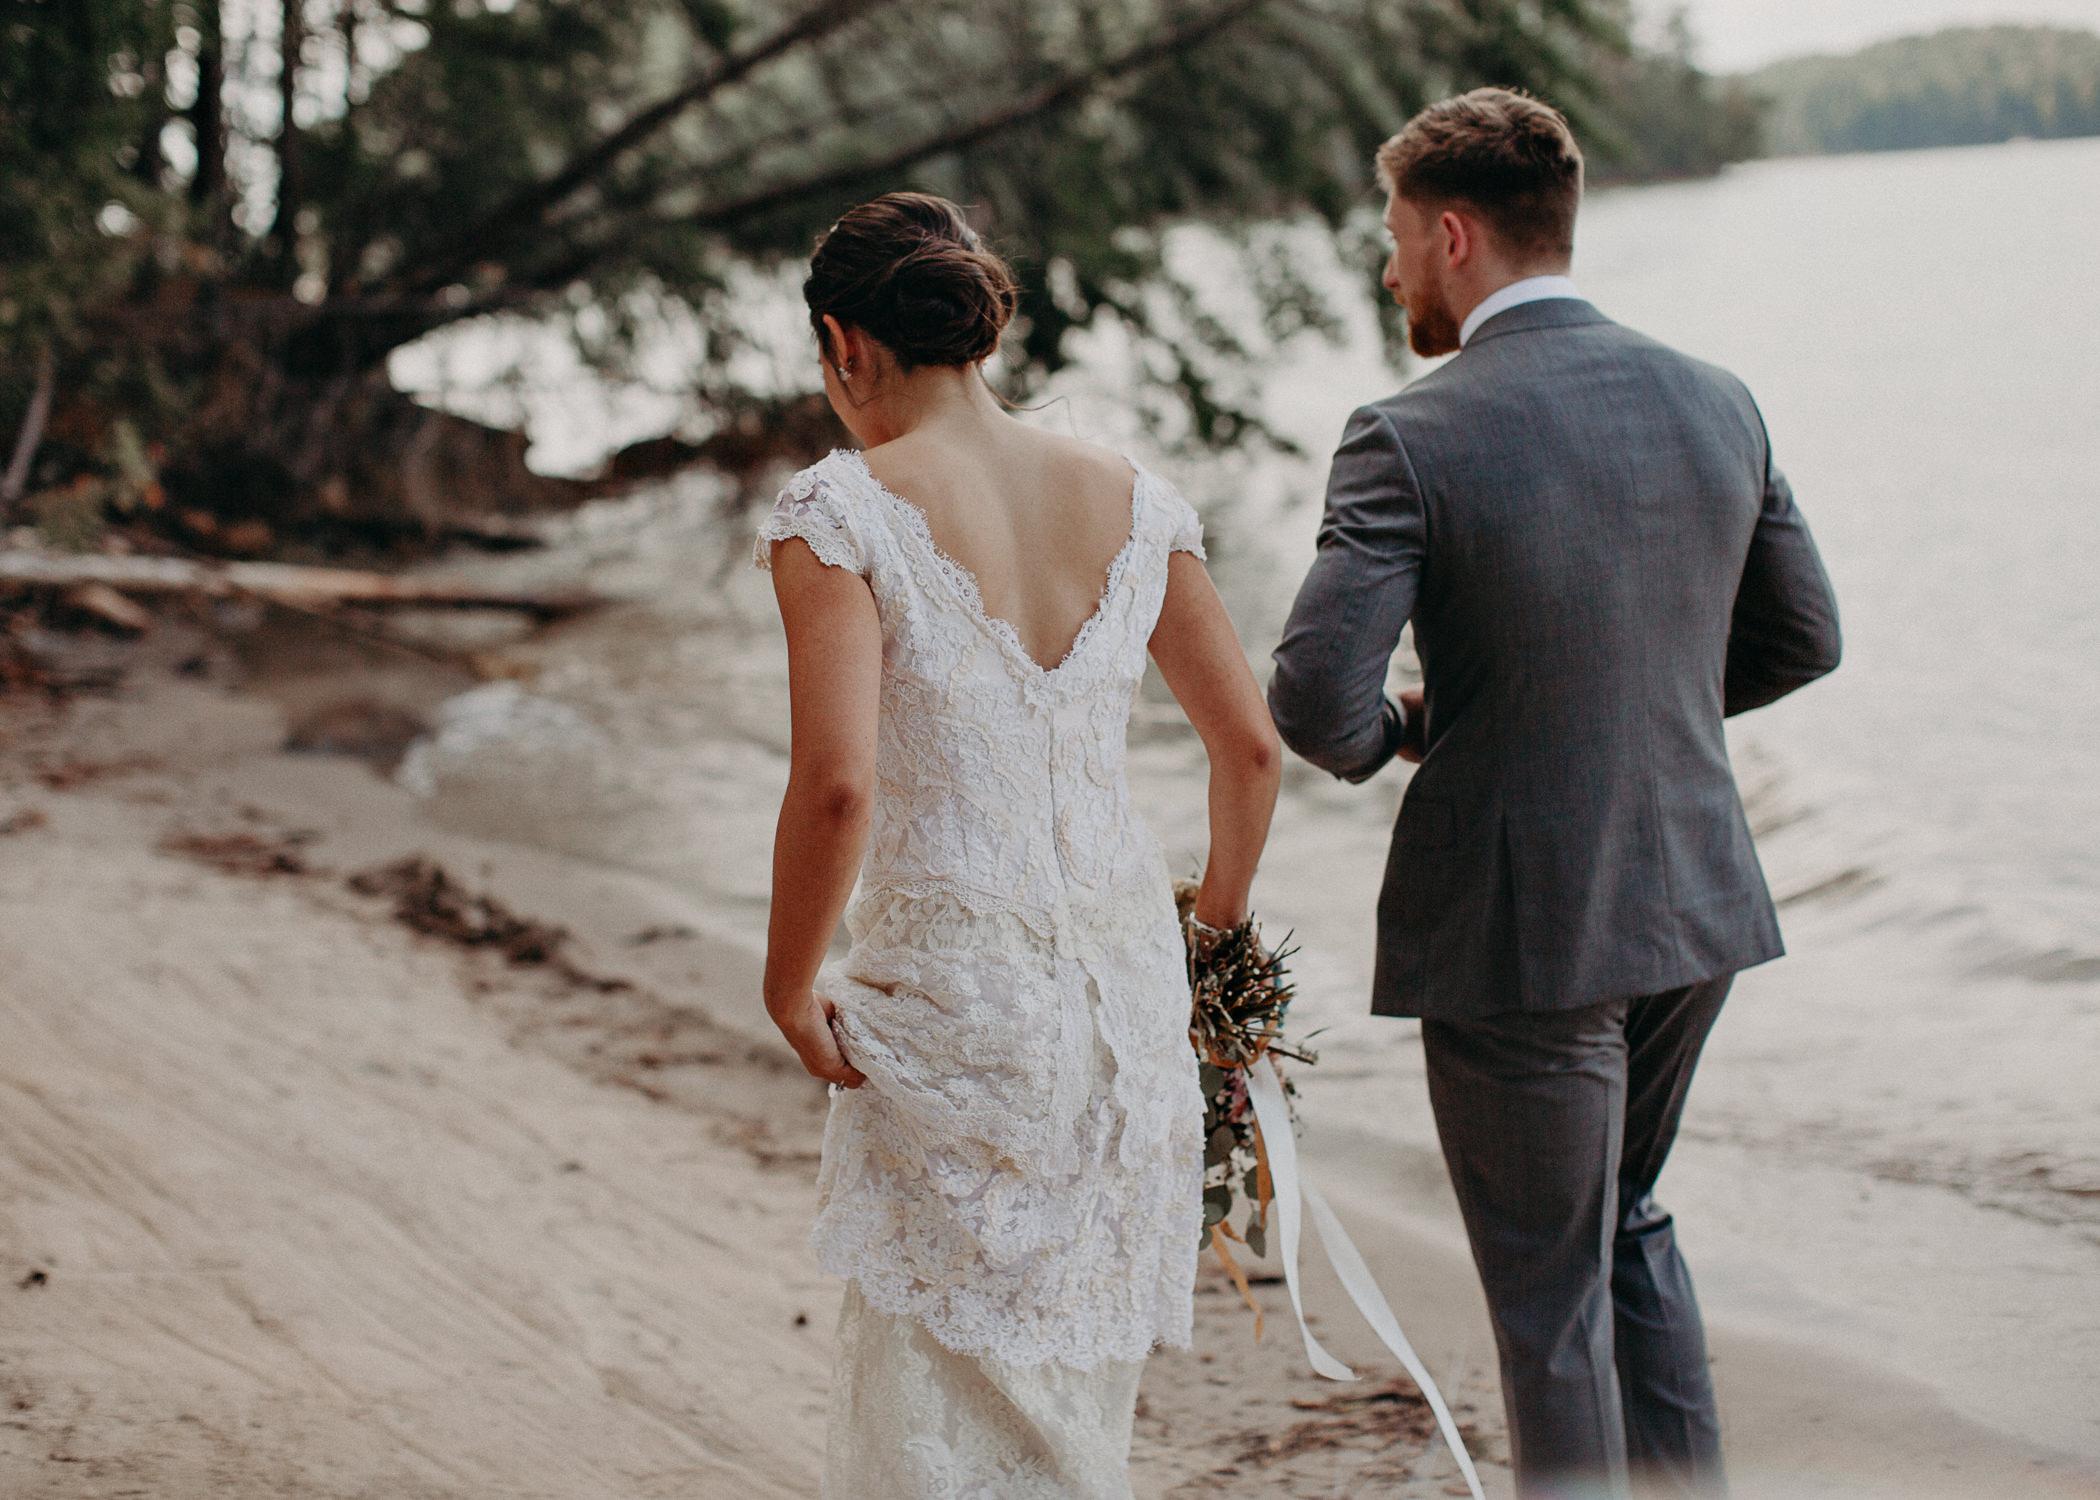 53 Bride & Groom Portraits before the ceremony on wedding day - Atlanta Wedding Photographer .jpg